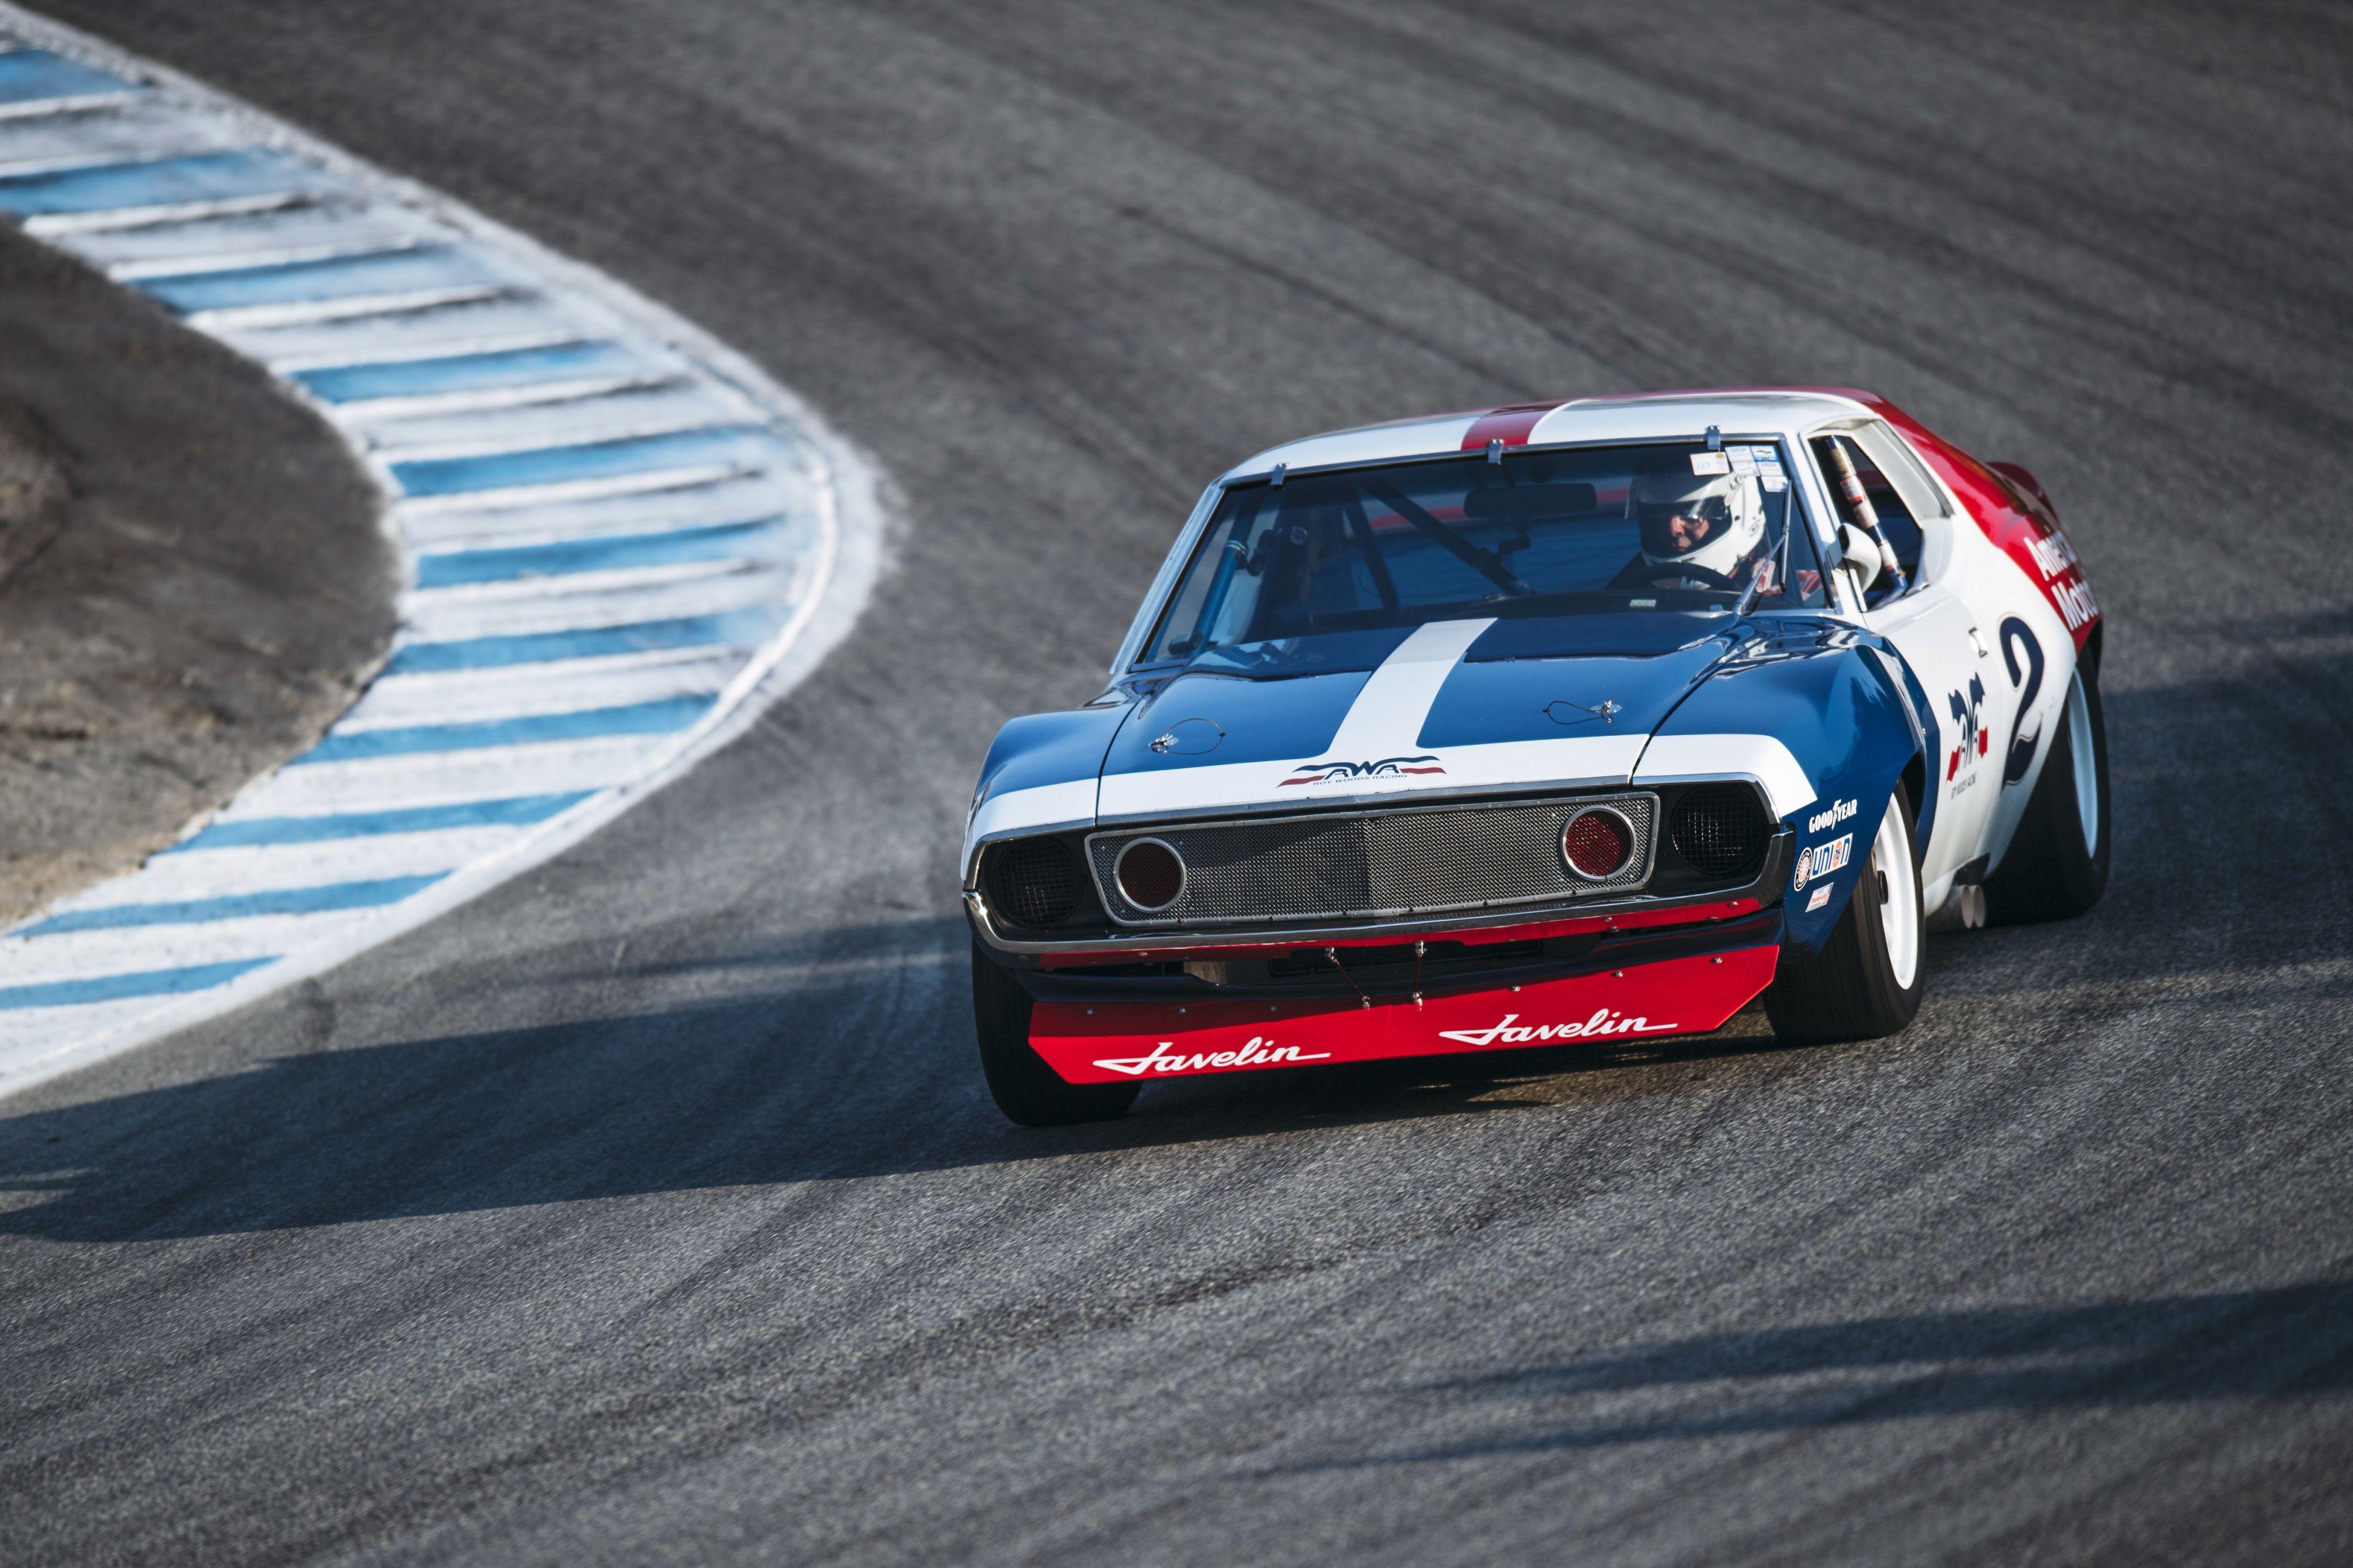 Laguna Seca Raceway >> Mazda Raceway Laguna Seca Is Getting Some Much Needed Updates